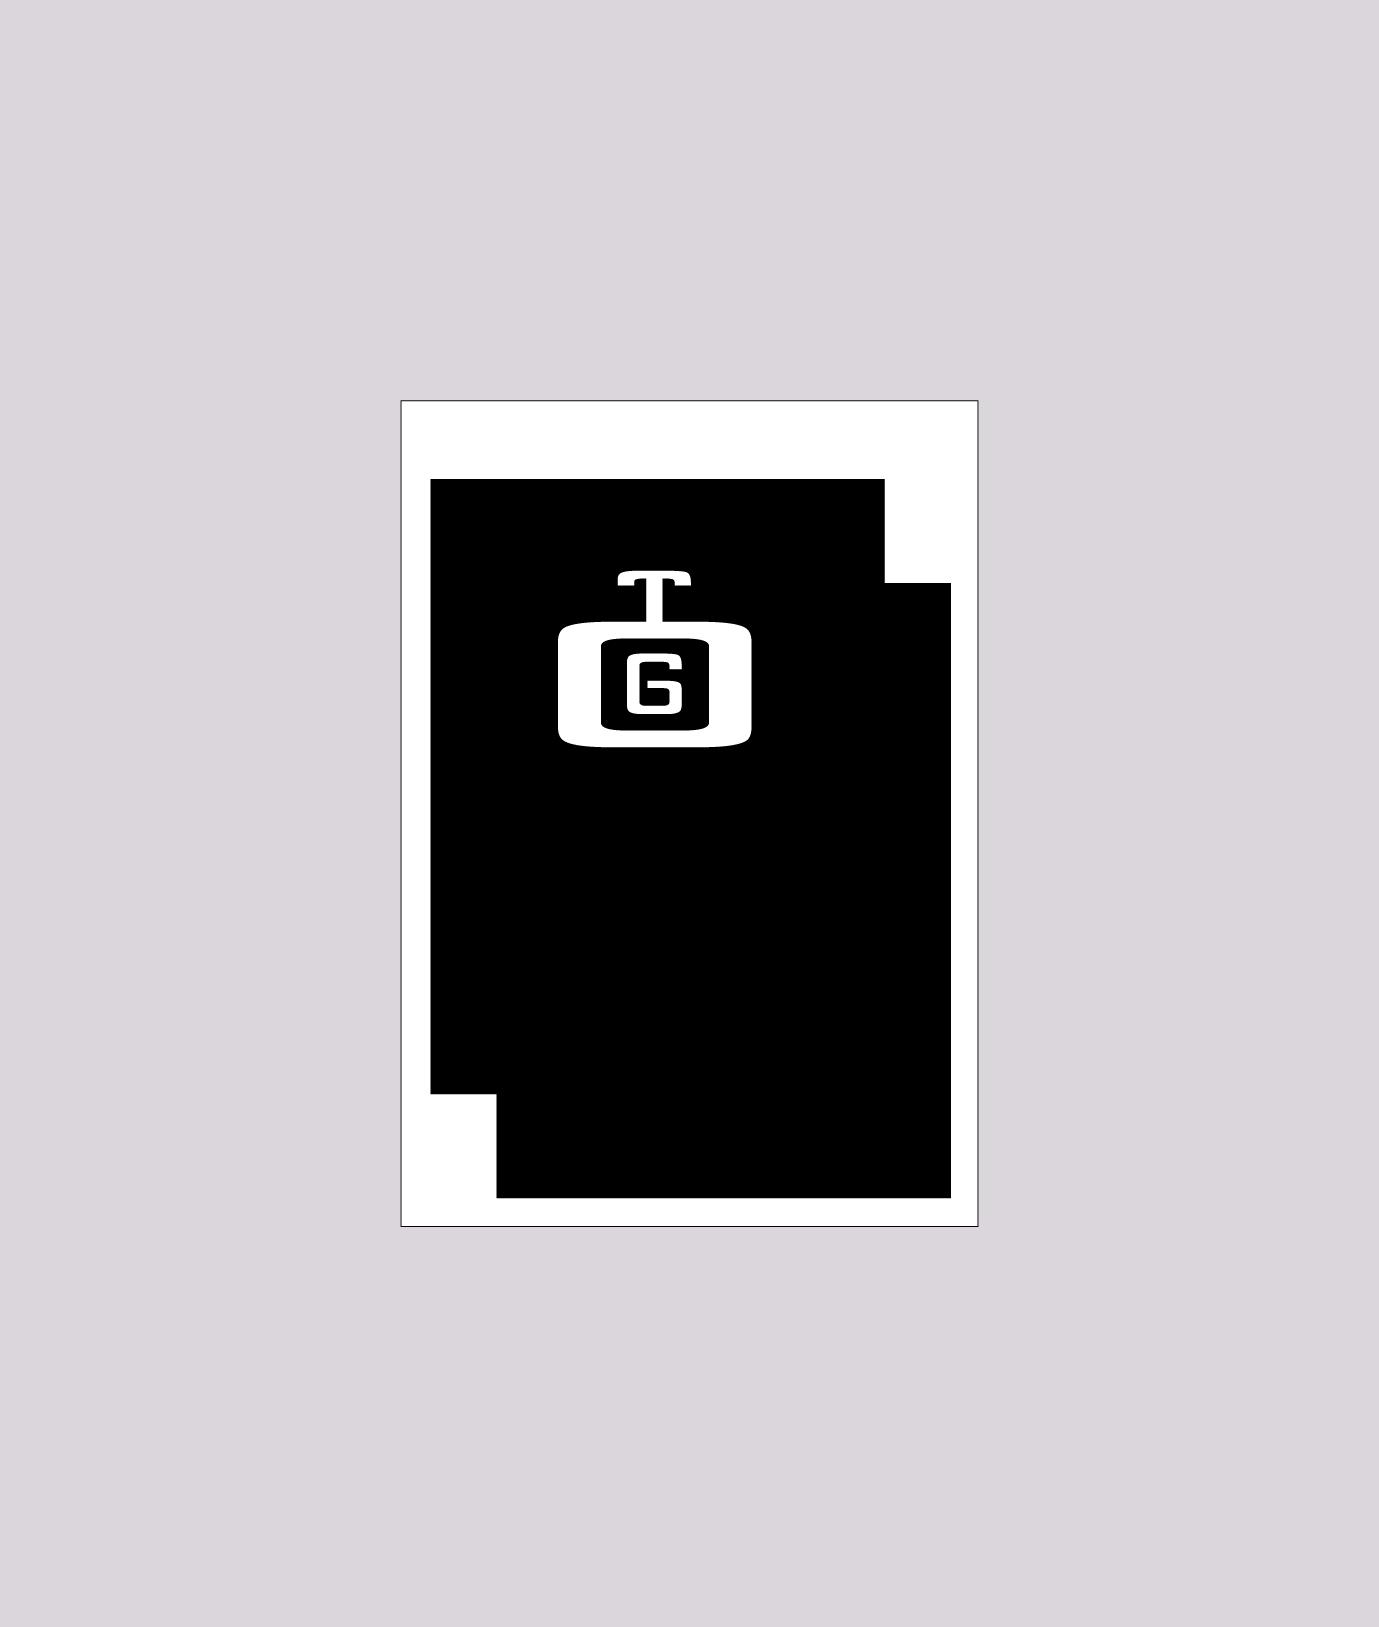 Разработать логотип и экран загрузки приложения фото f_5905a7dbb6f6830d.jpg